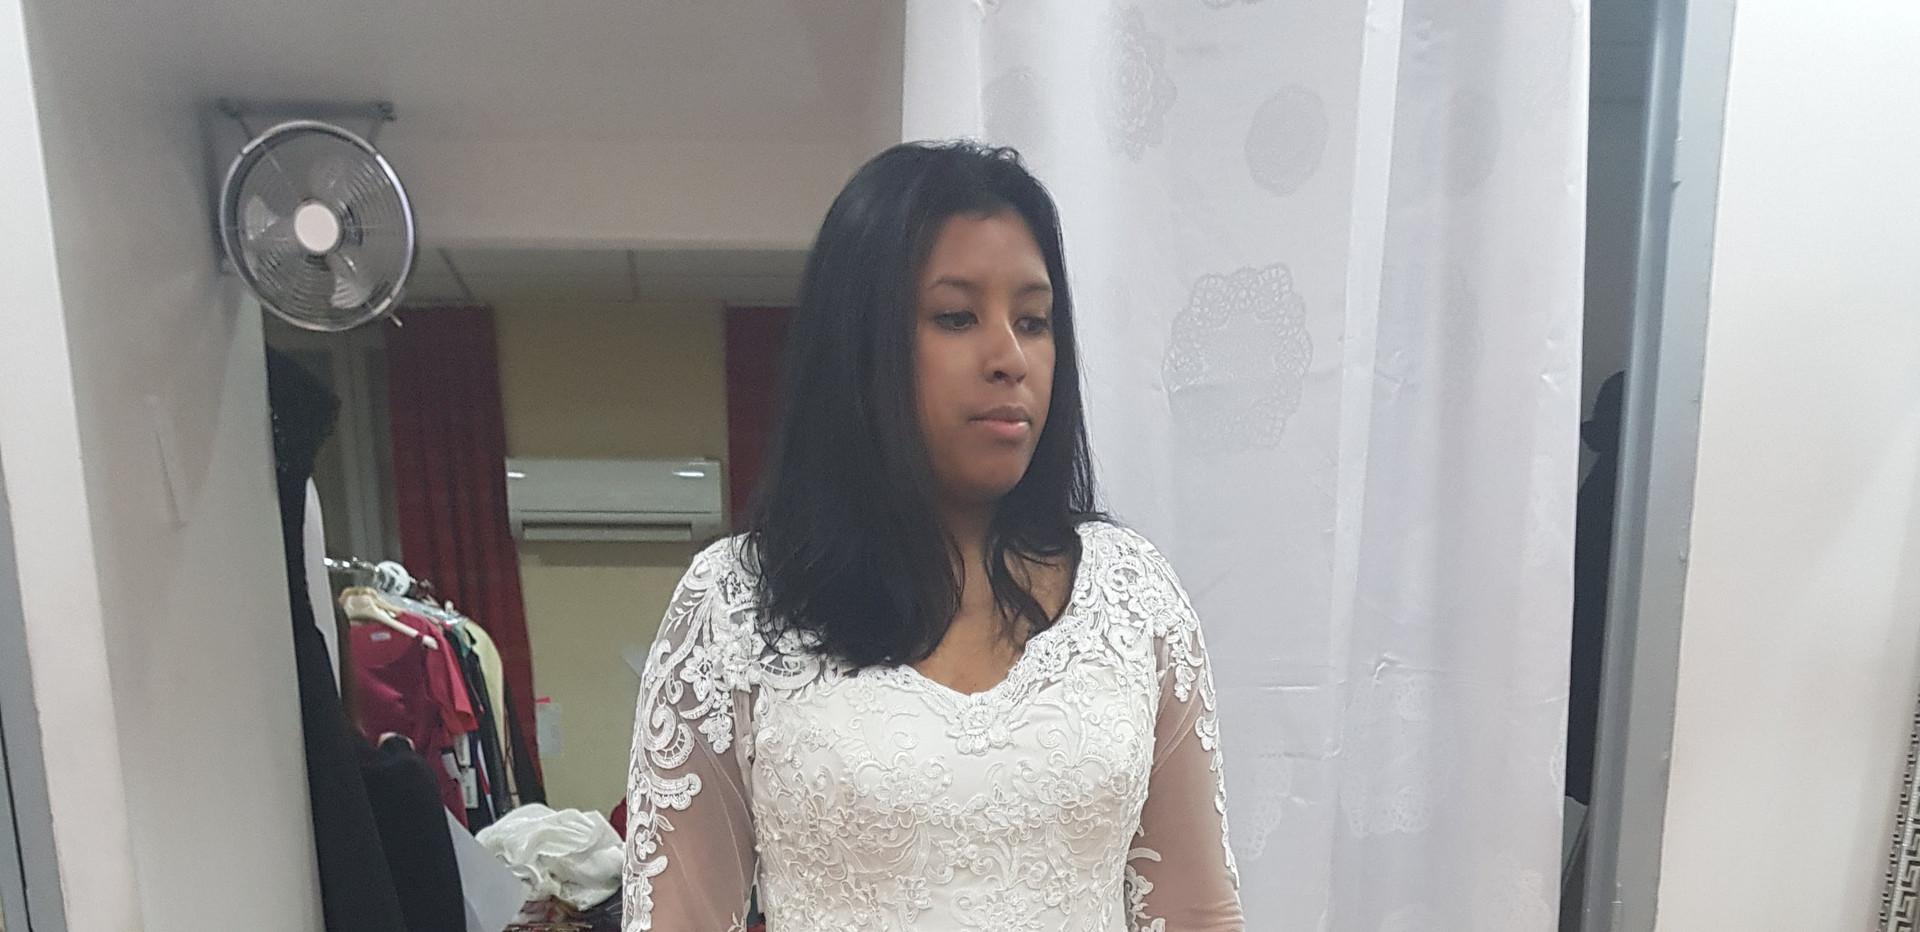 Robe de mariage longues manches.jpg